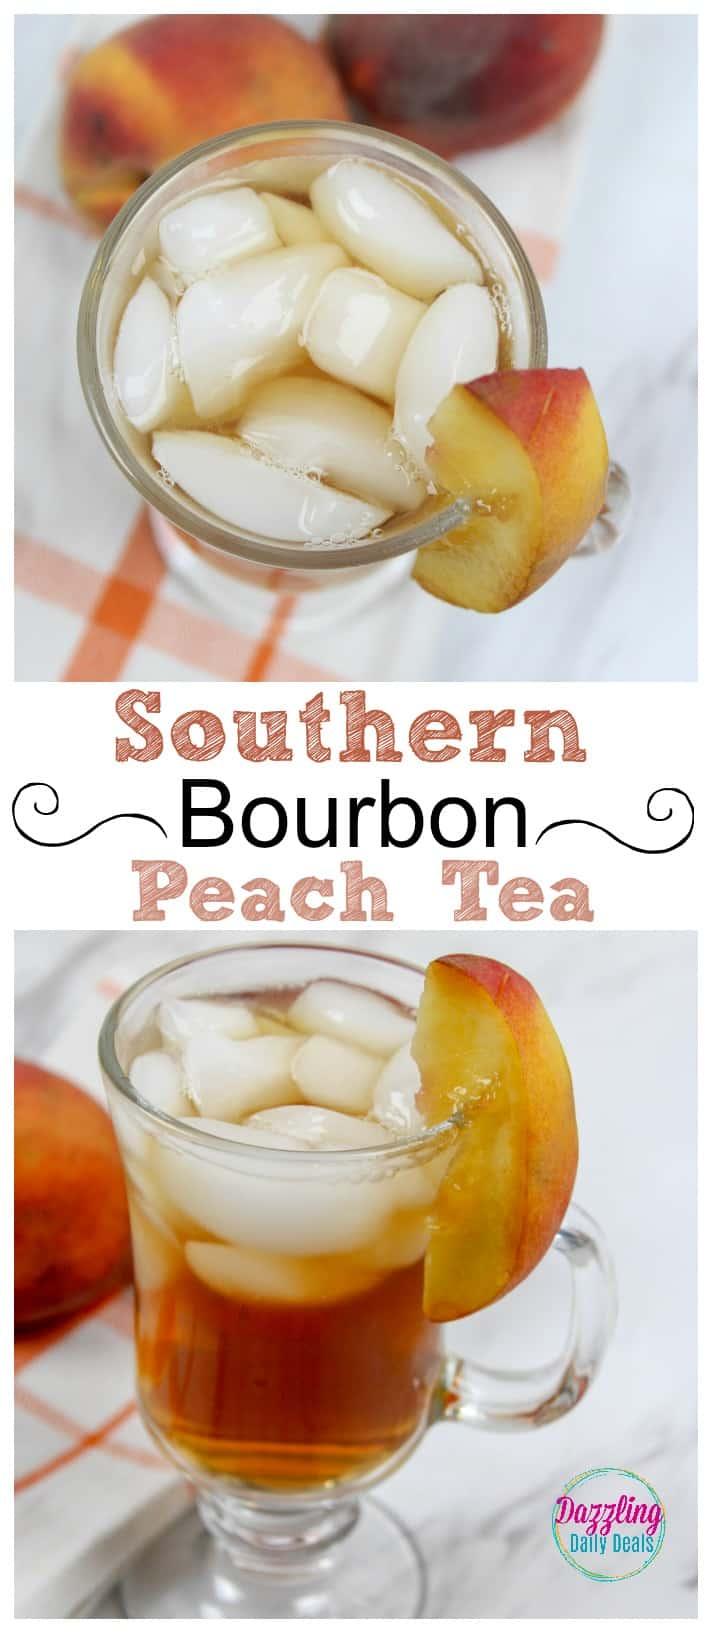 Southern Bourbon Peach tea